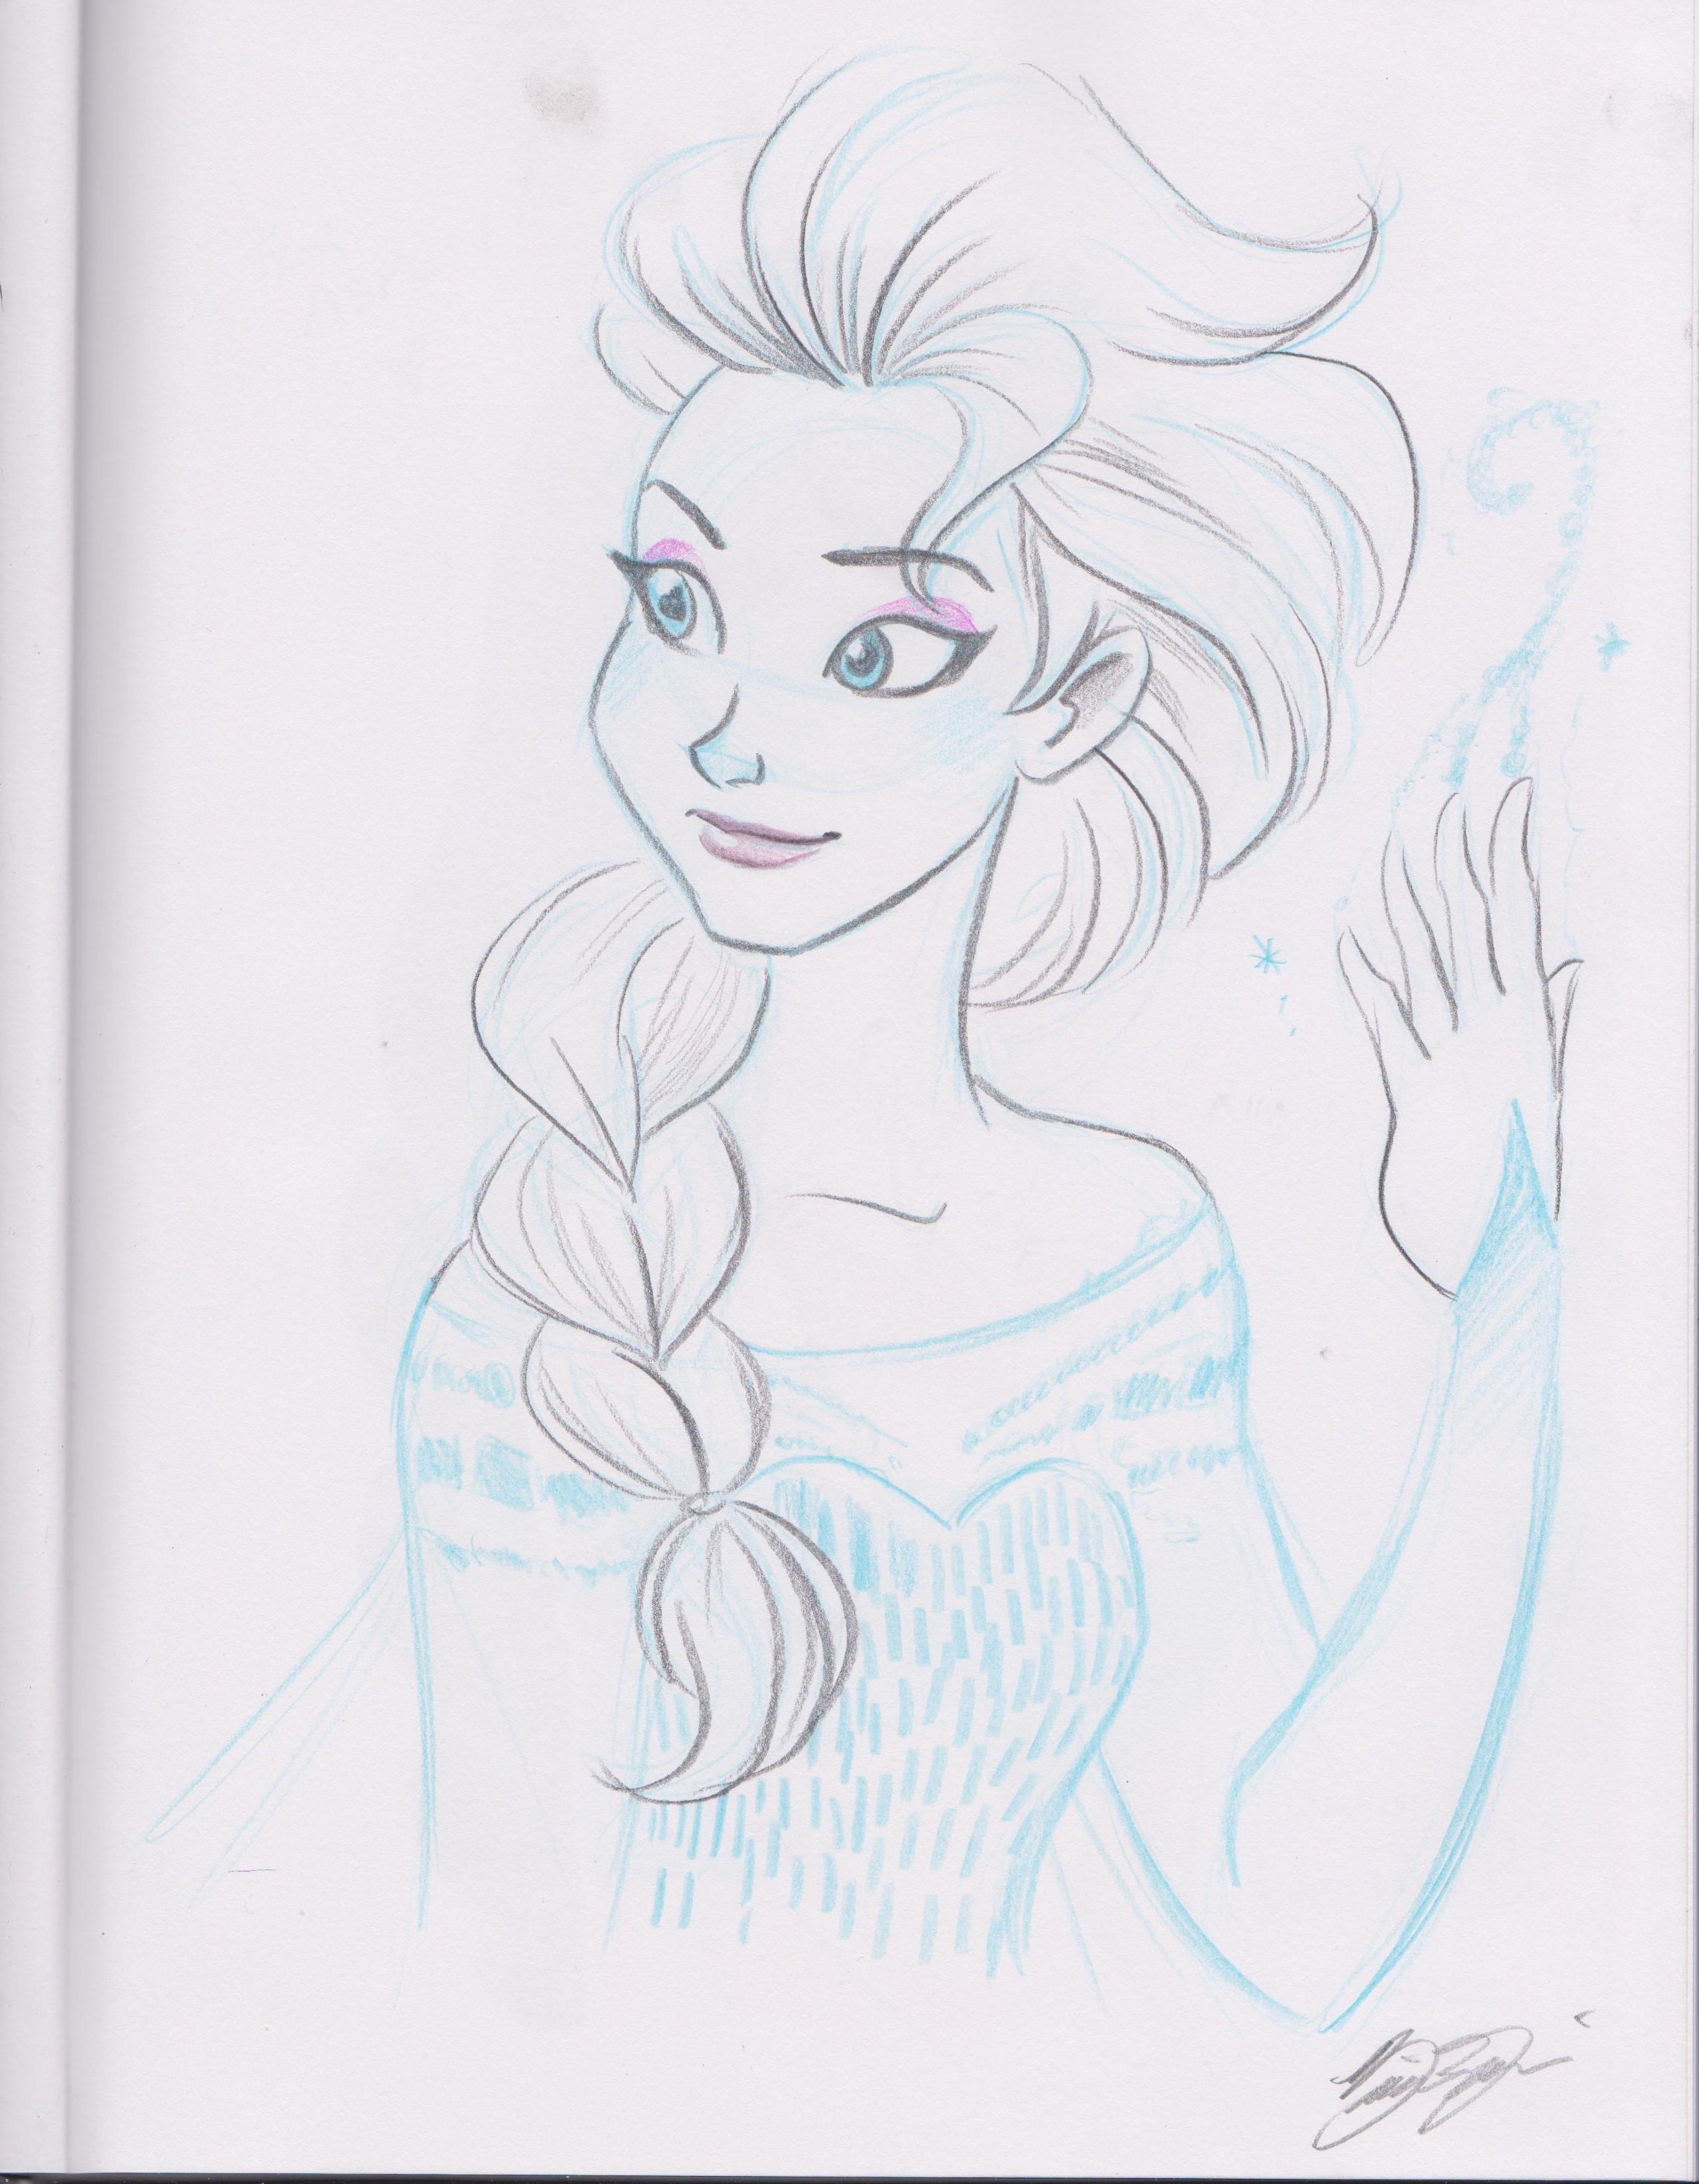 Queen Elsa by Brianna Garcia